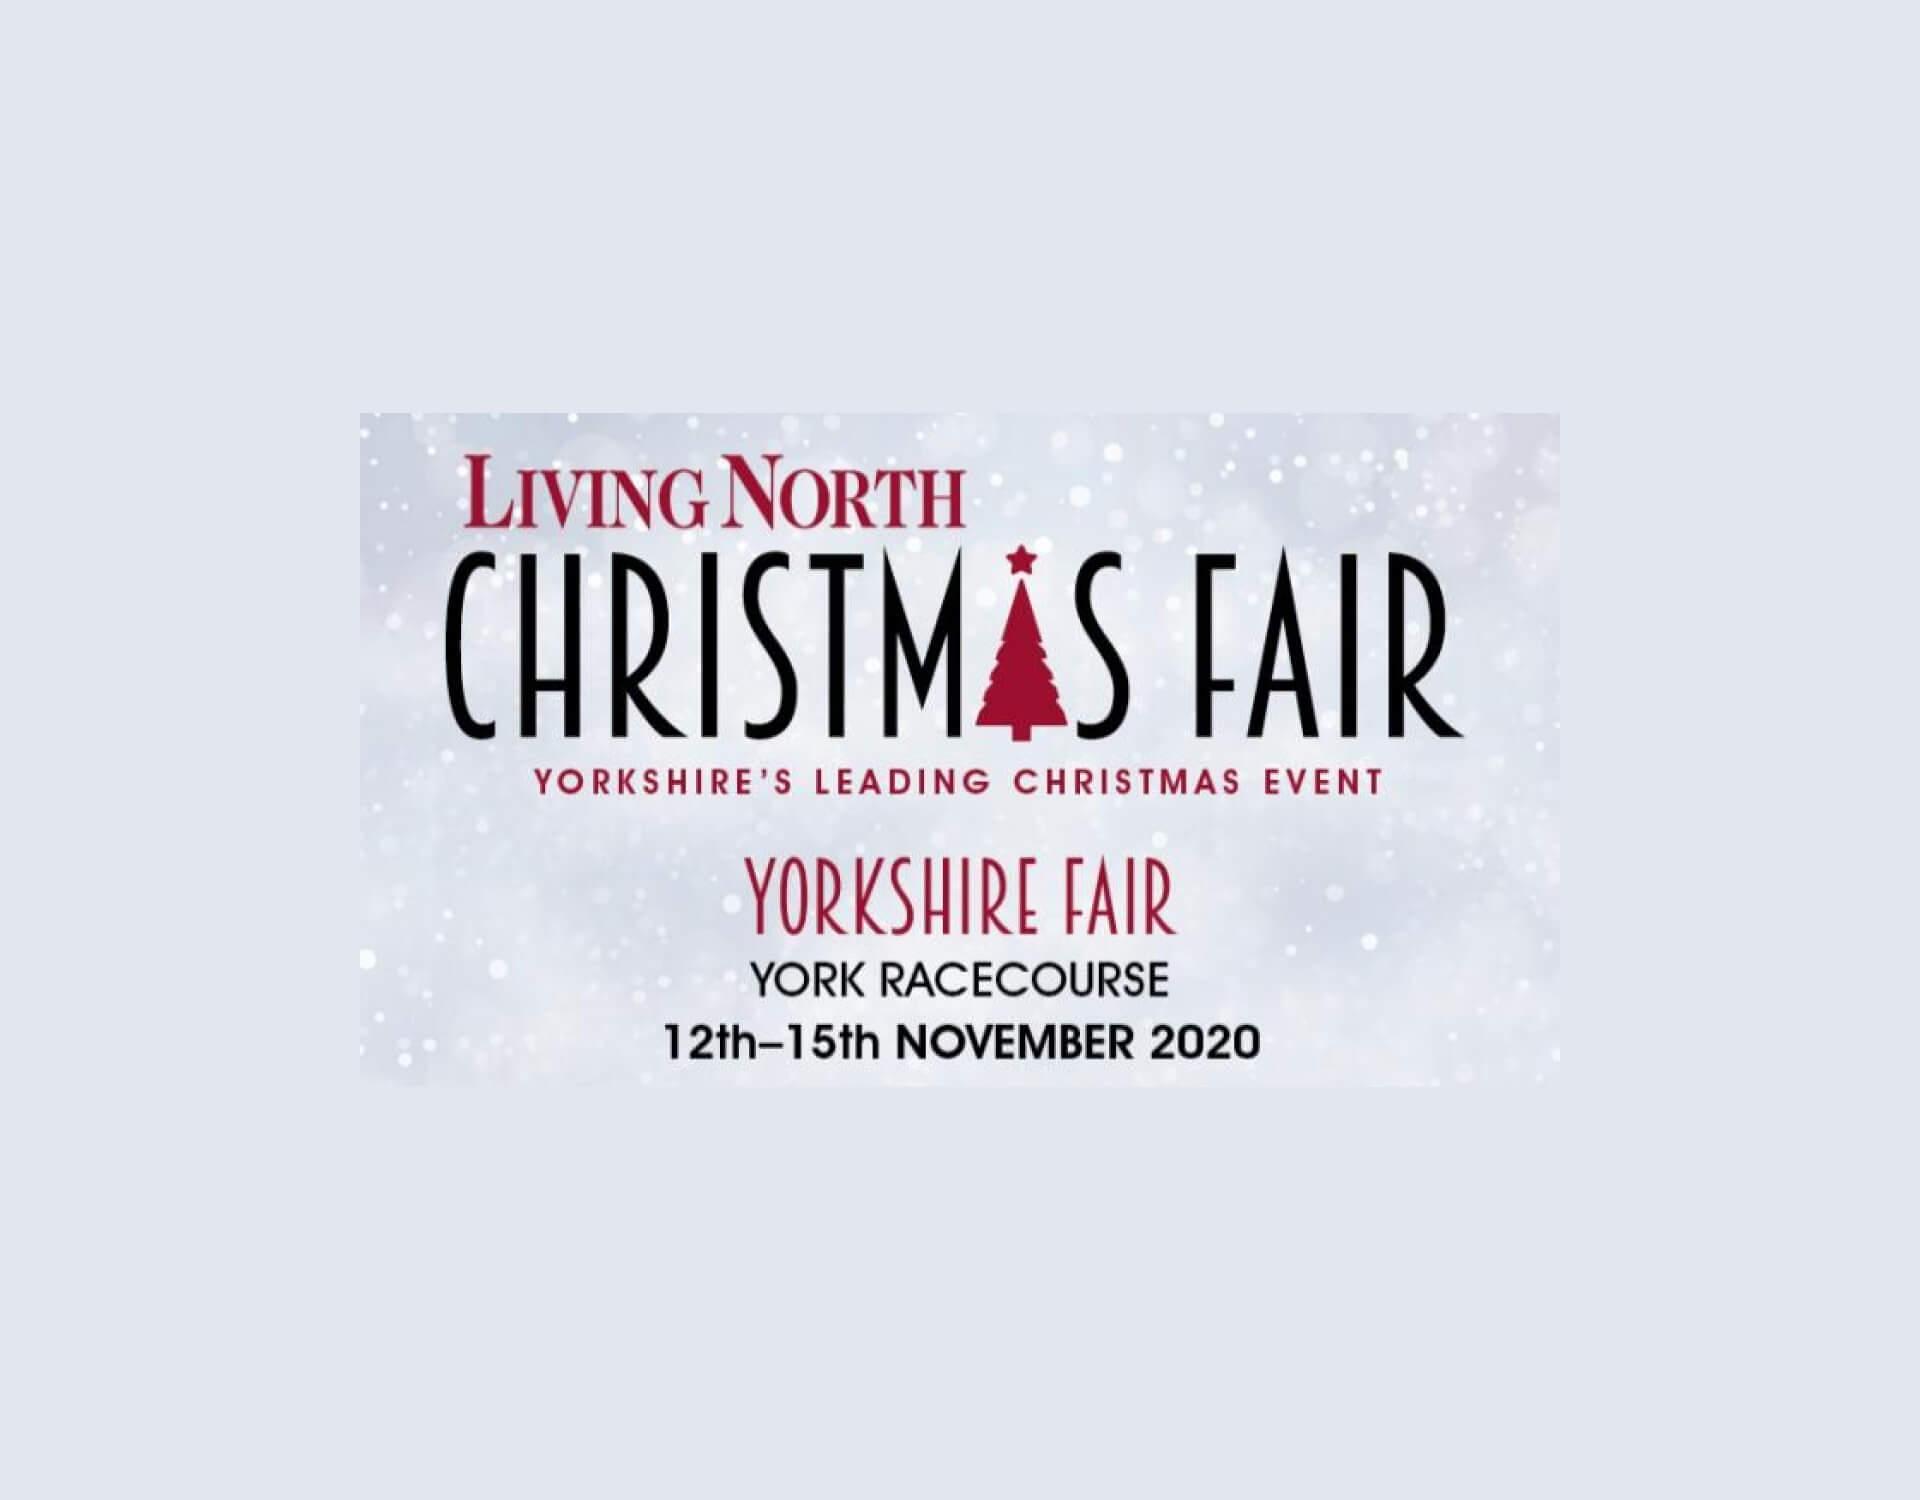 Living North Christmas Fair, York